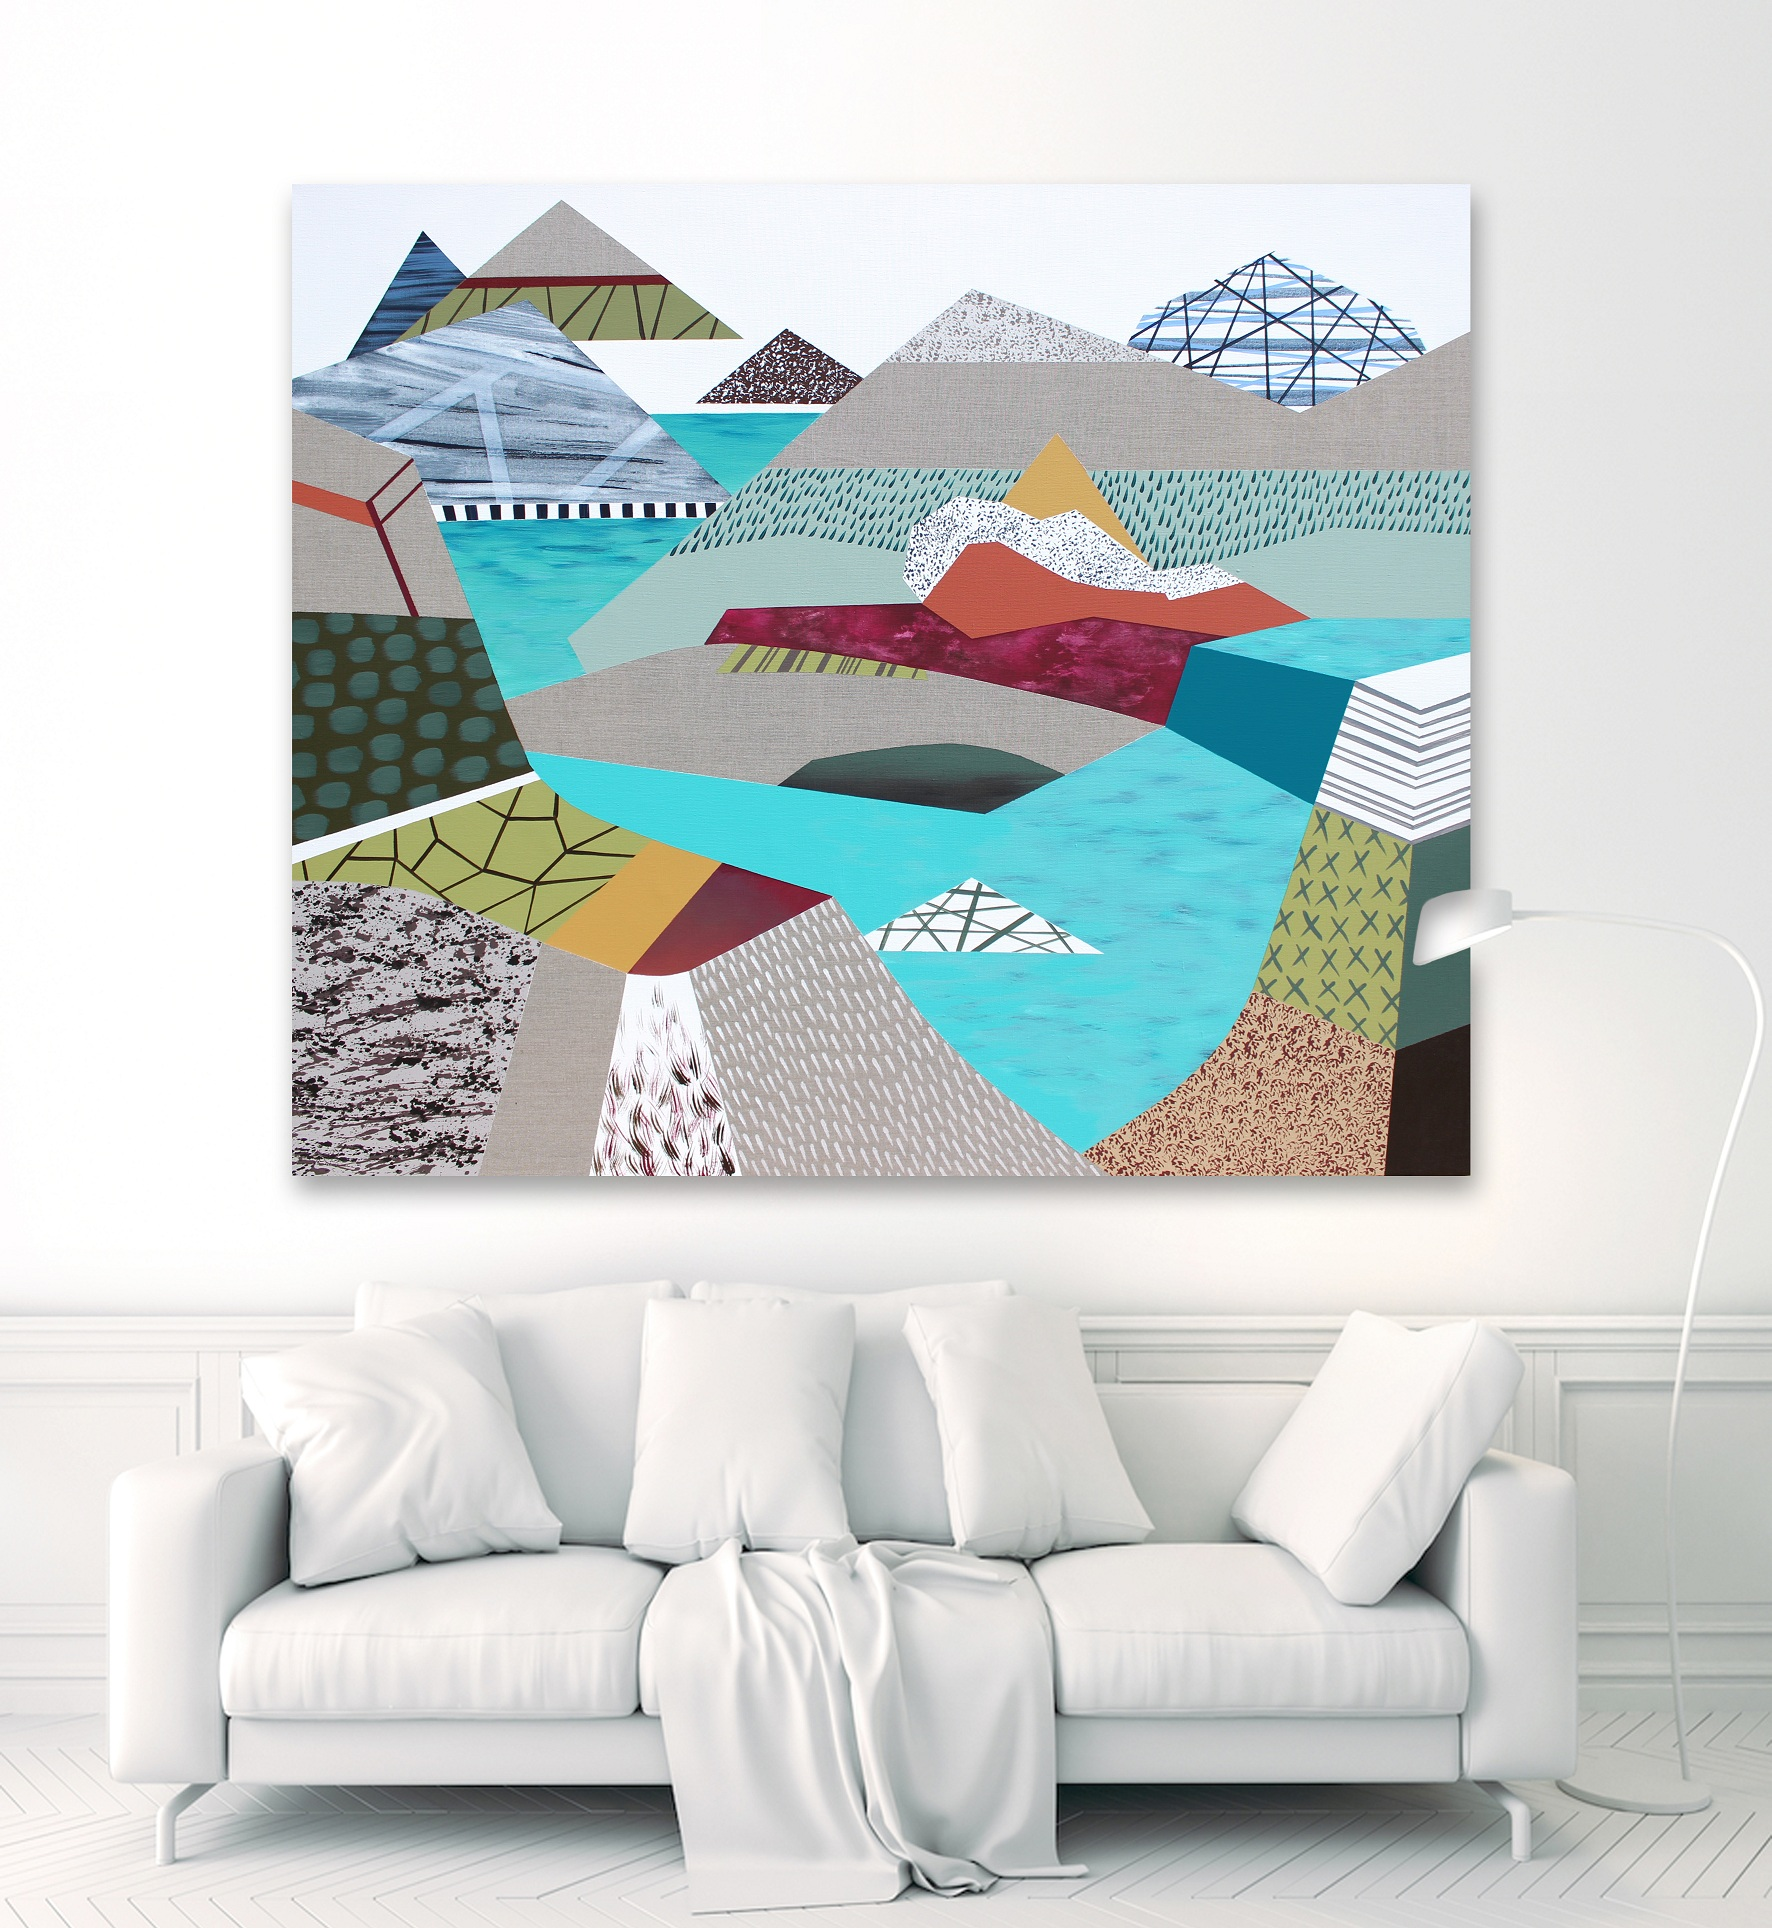 My Personal Landscape 31,2019,110x130cm